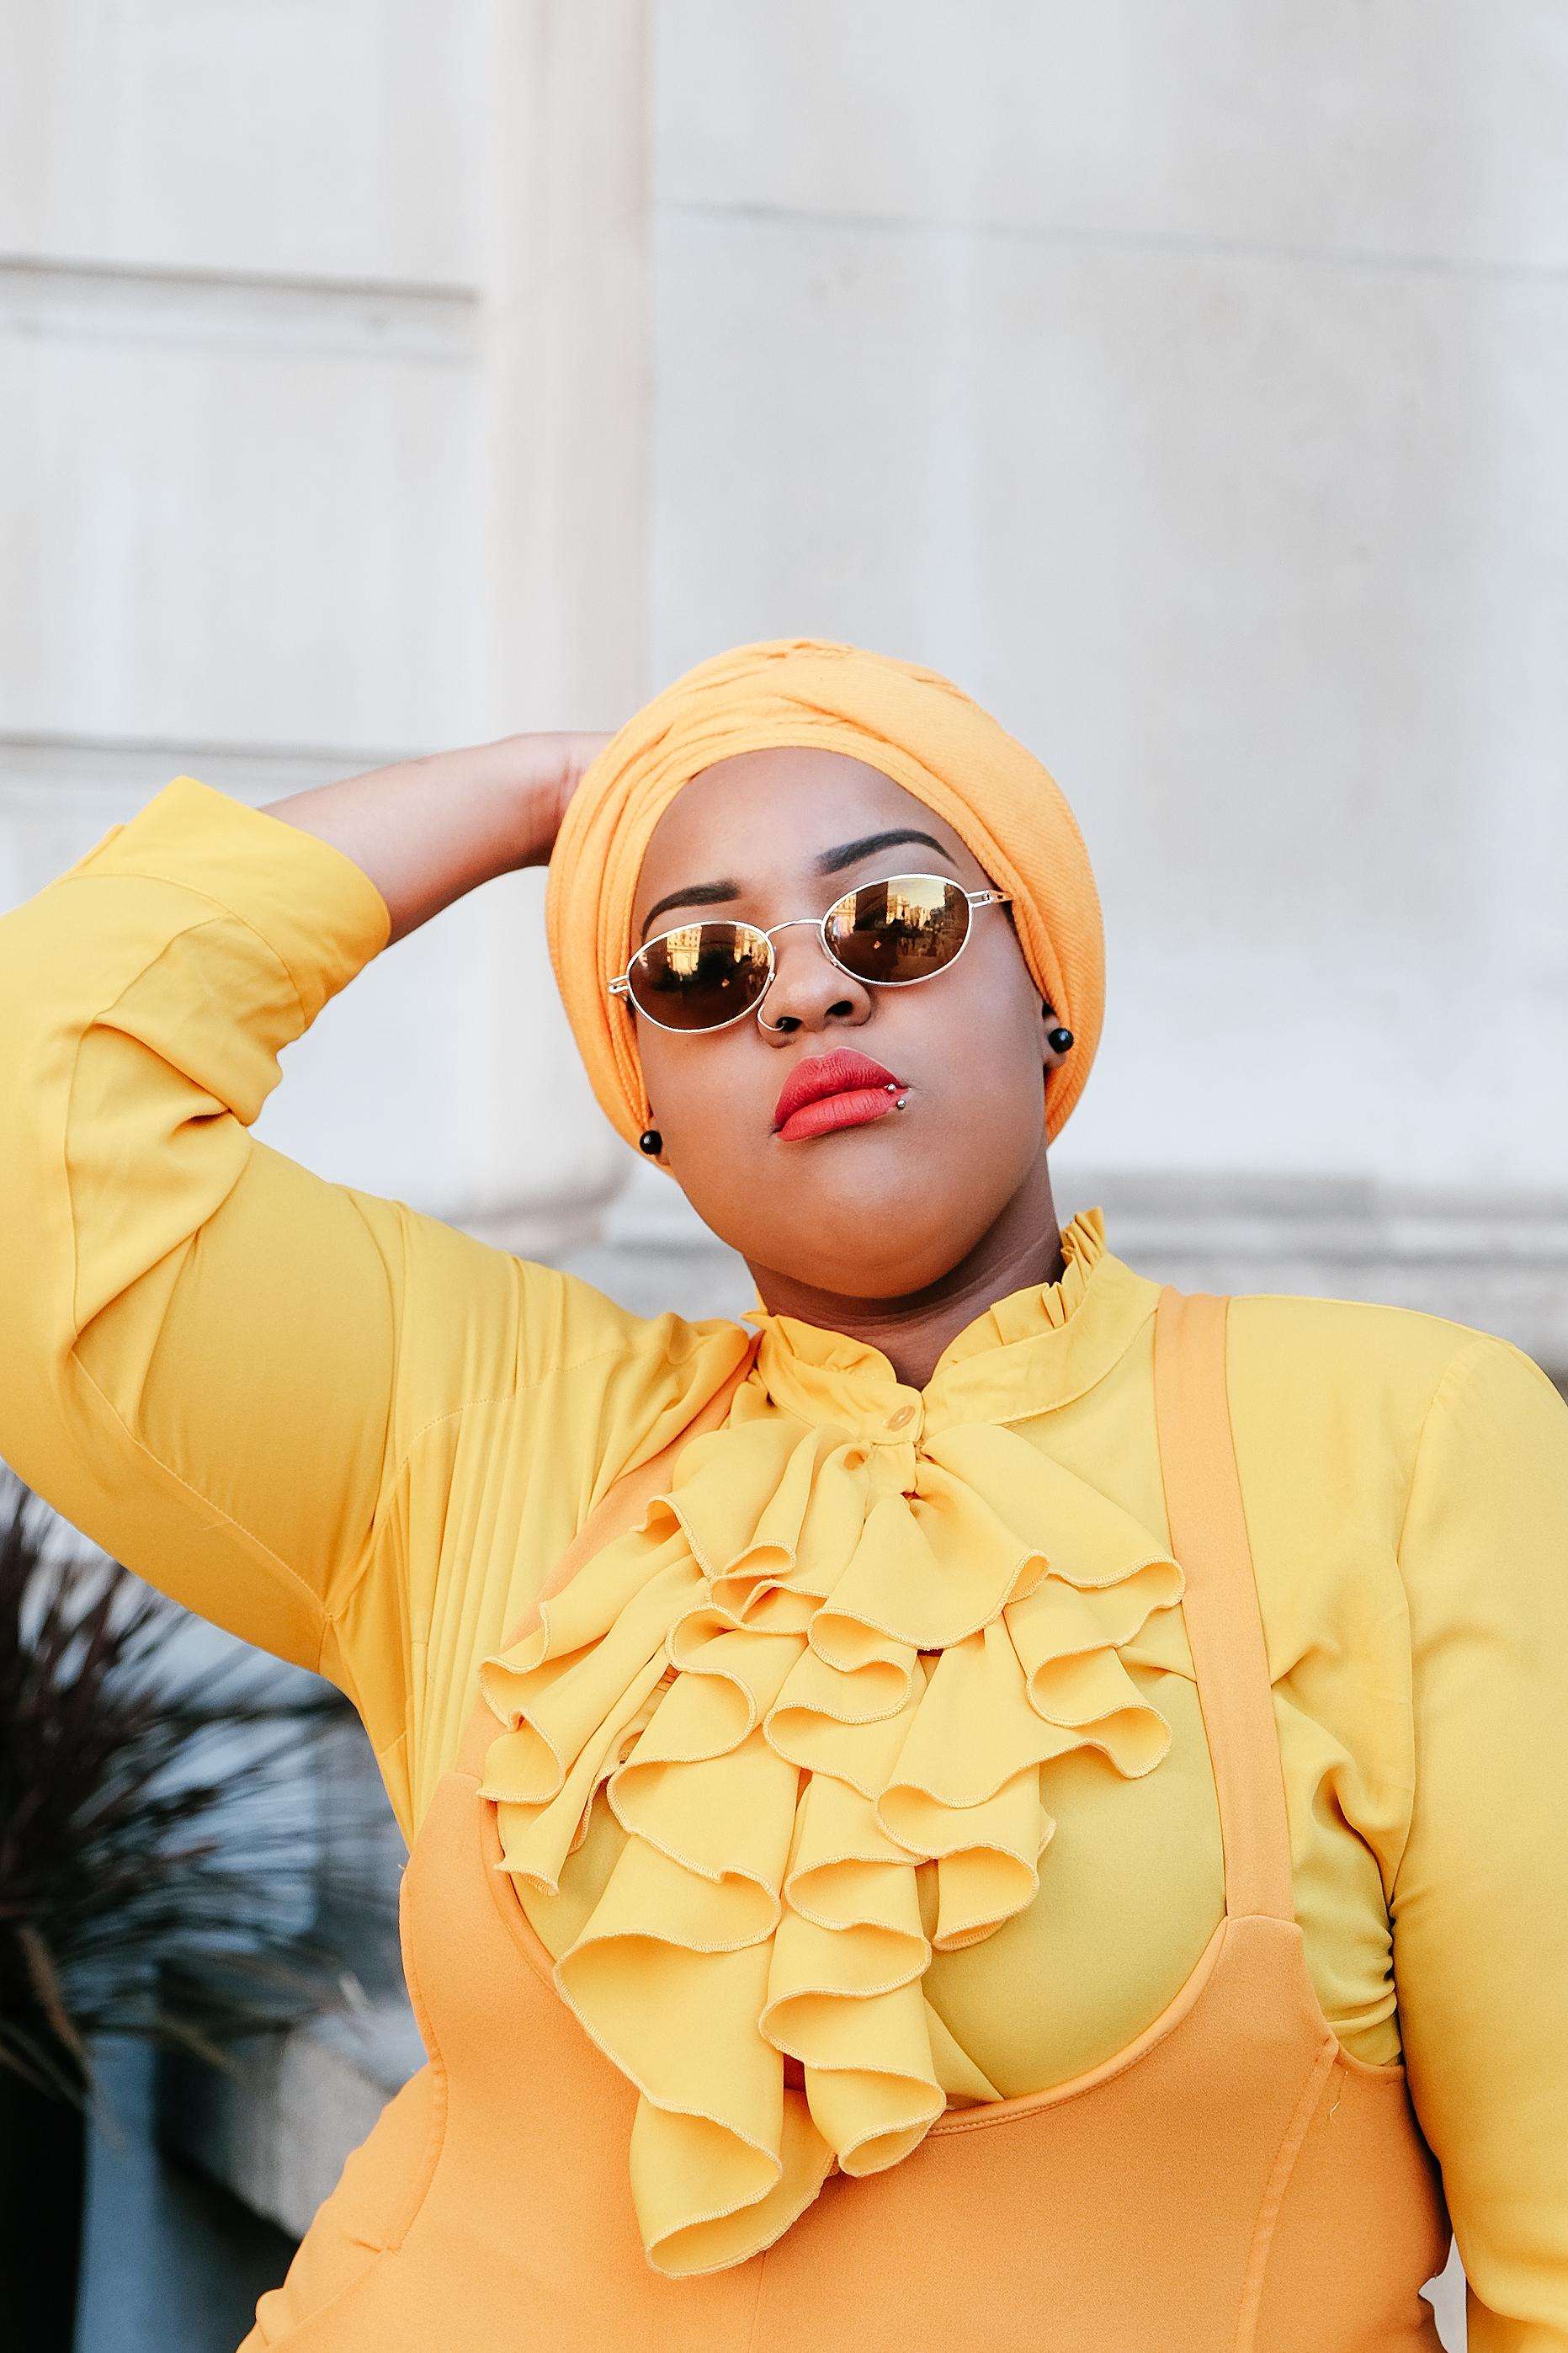 Leah-Vernon-Plus-Size-Body-Positive-Model-Detroit-Muslim-Girl-Black-Instagram-Bloggers-1-model monday